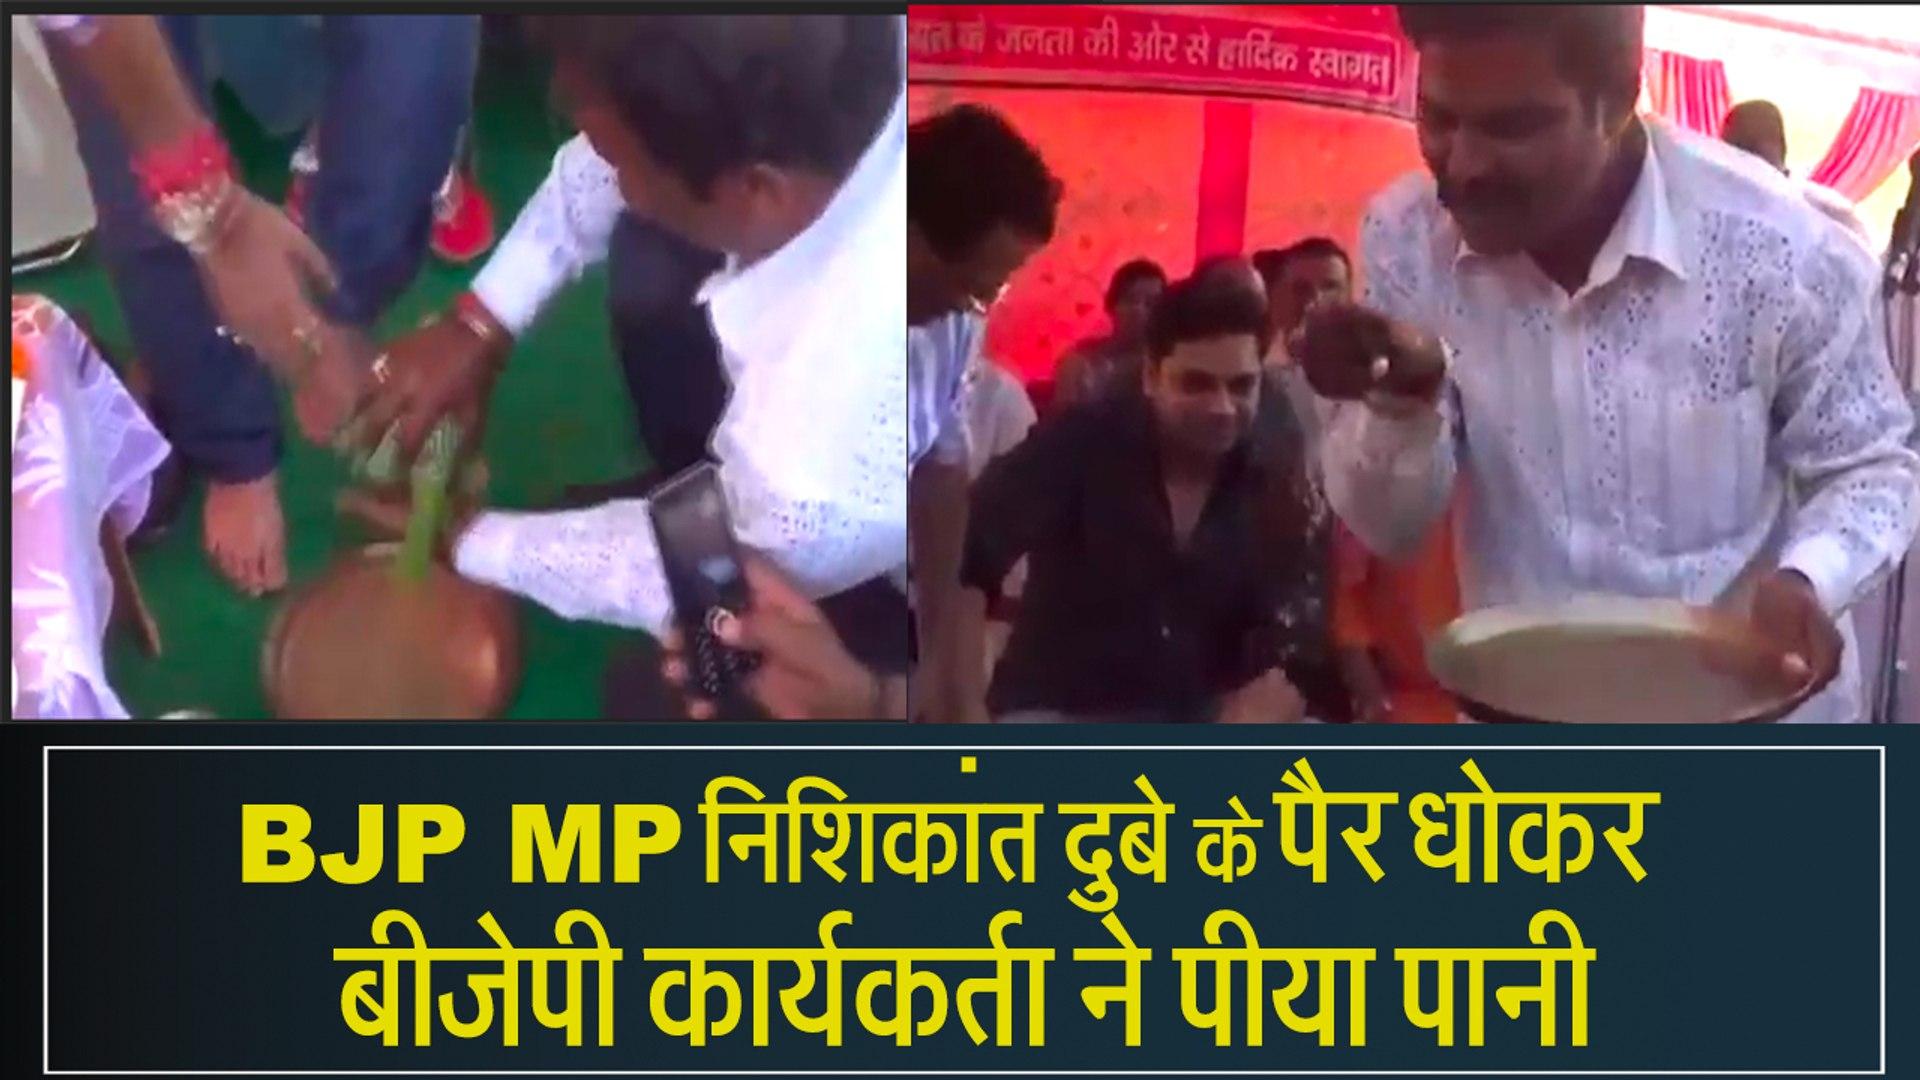 Jharkhand News II BJP worker washes feet of Godda MP Nishikant Dubey & drinks that water